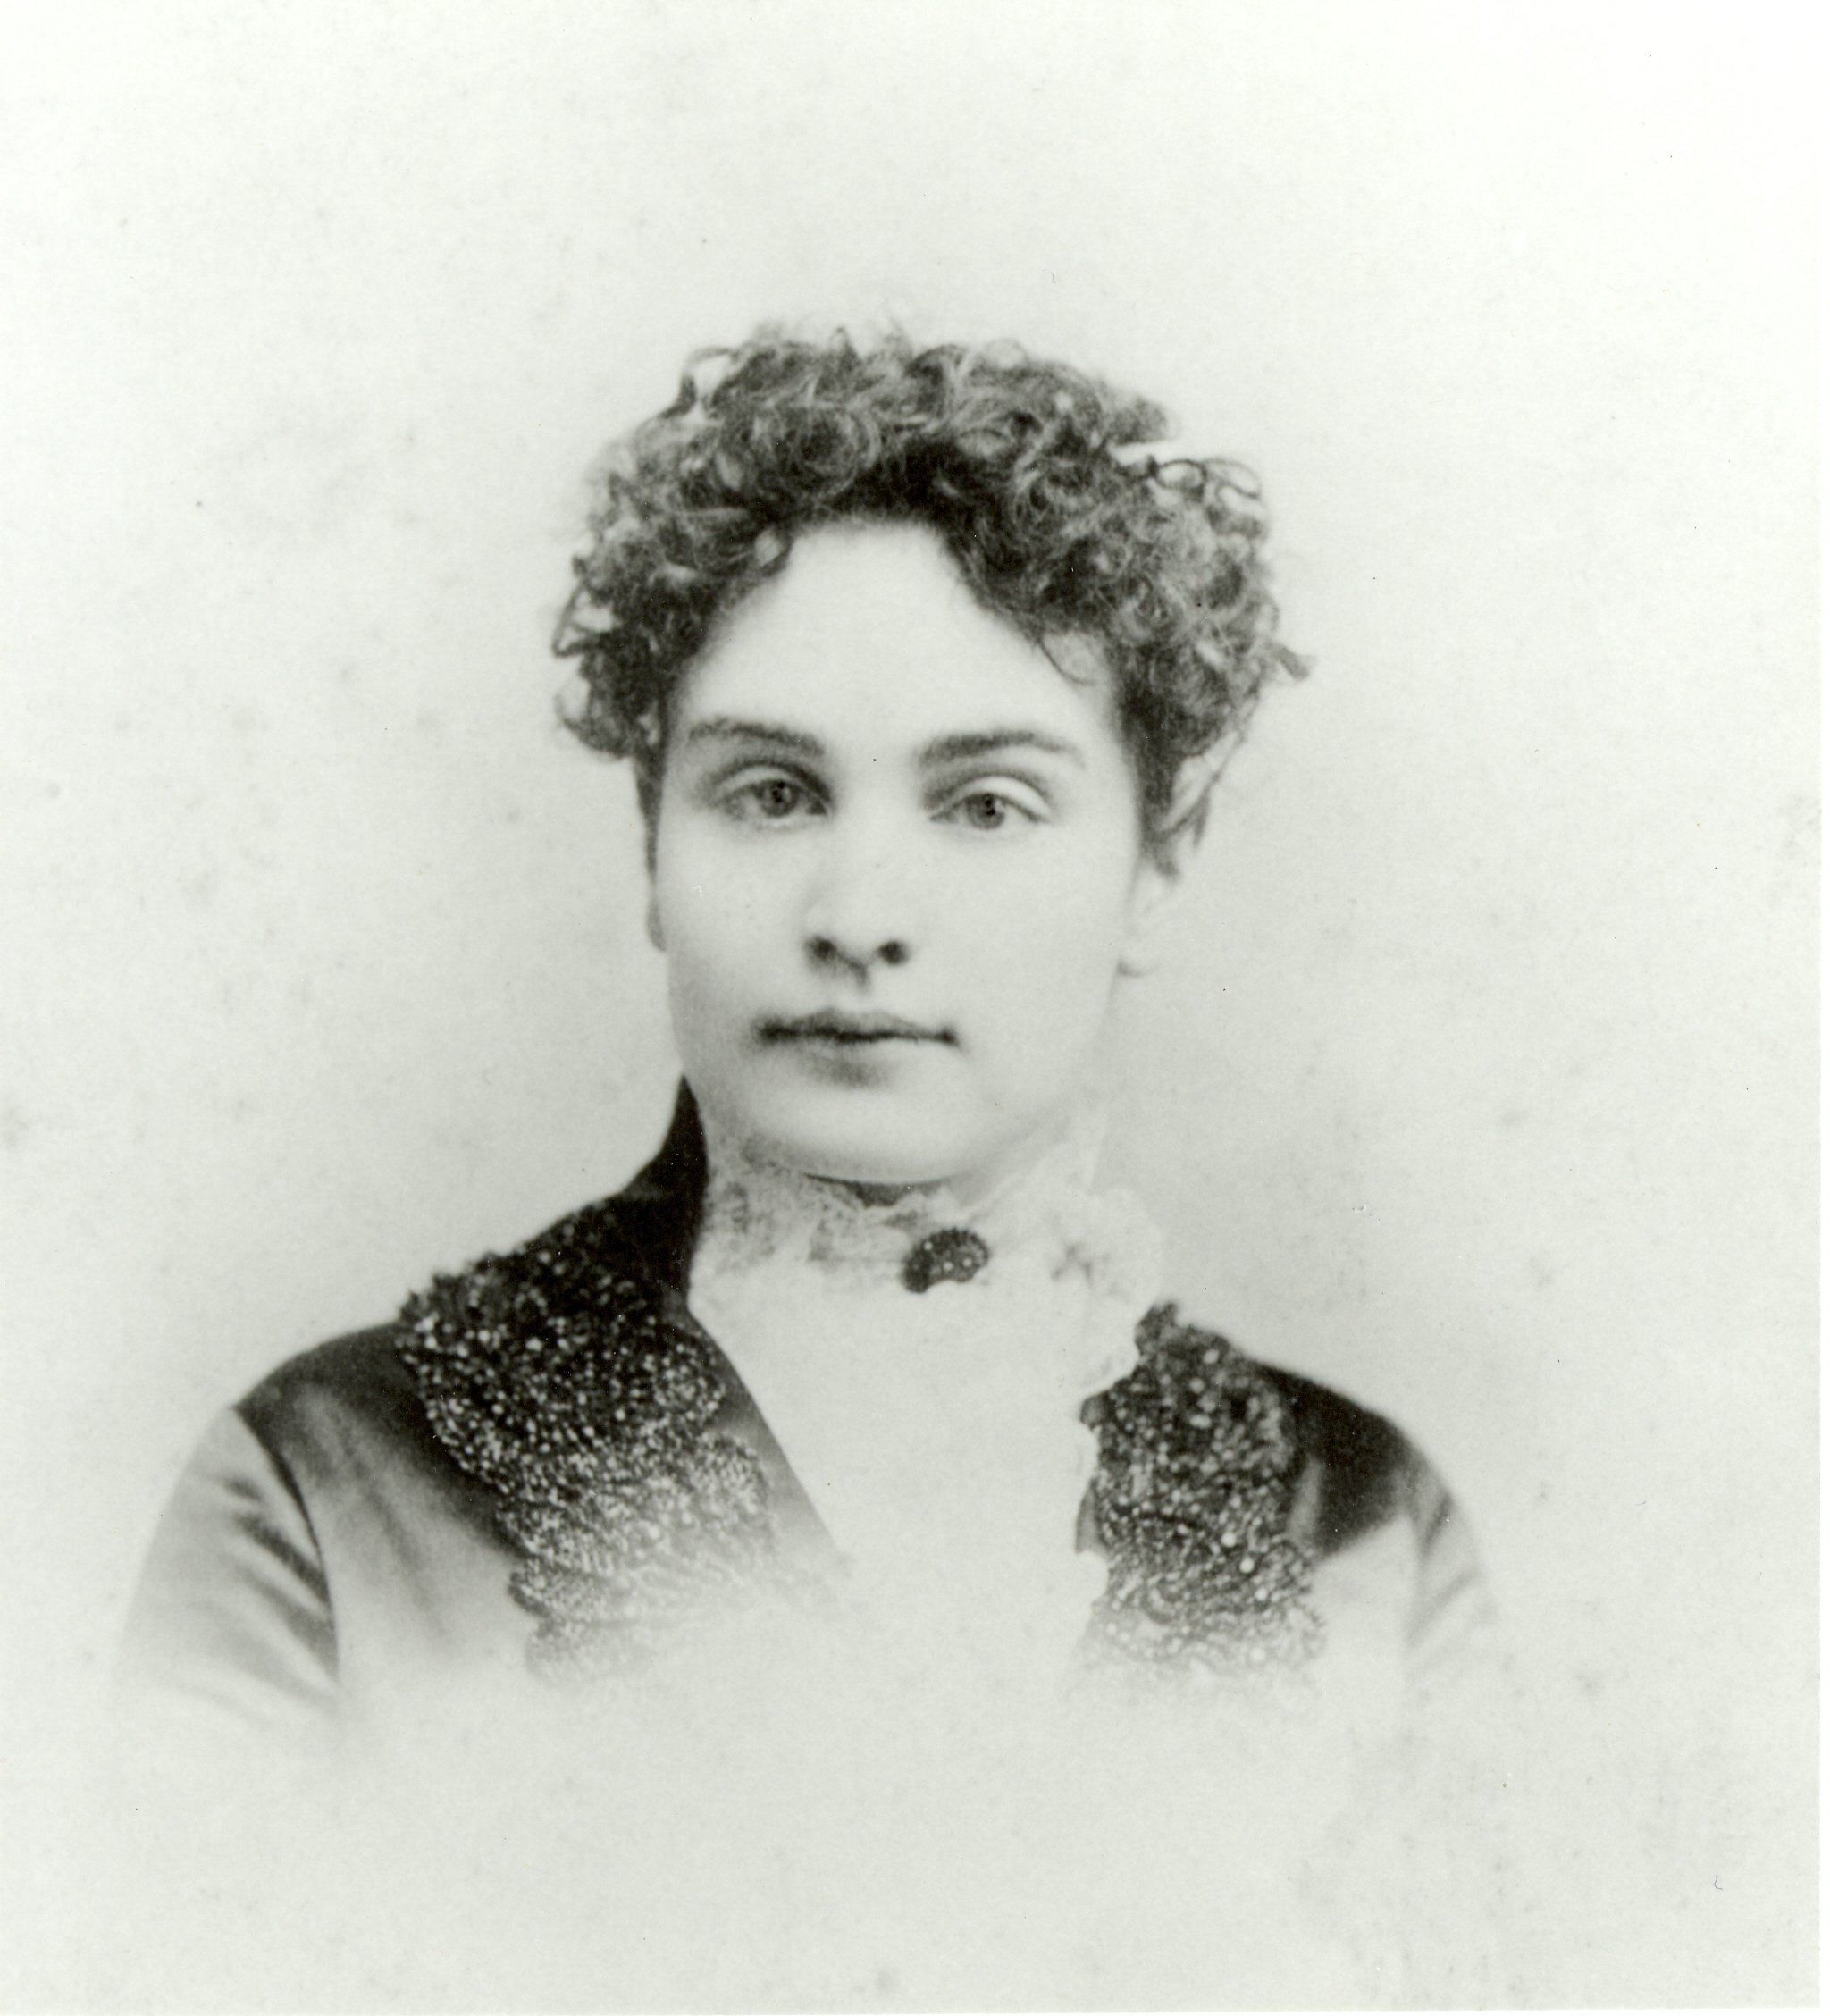 Photo portrait of Anne Sullivan